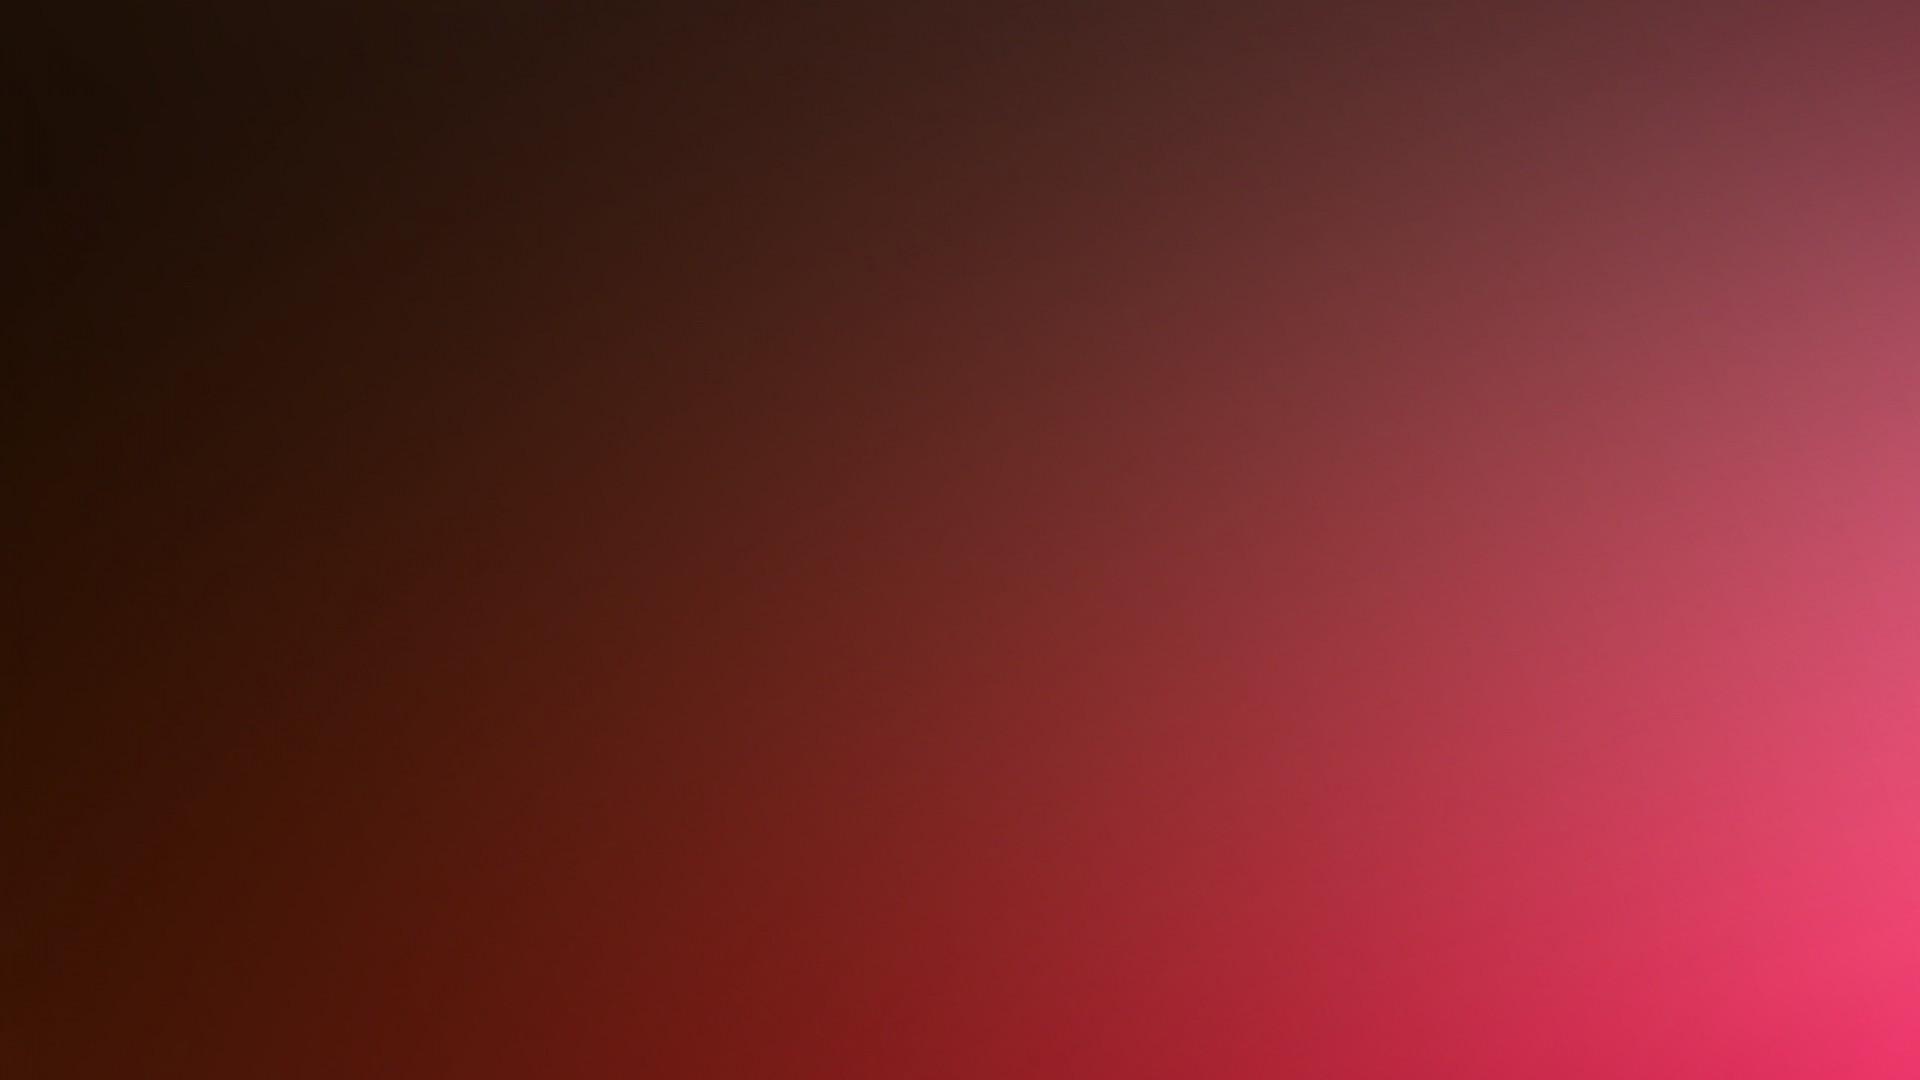 Wallpaper pink, shadow, background, colors, dark